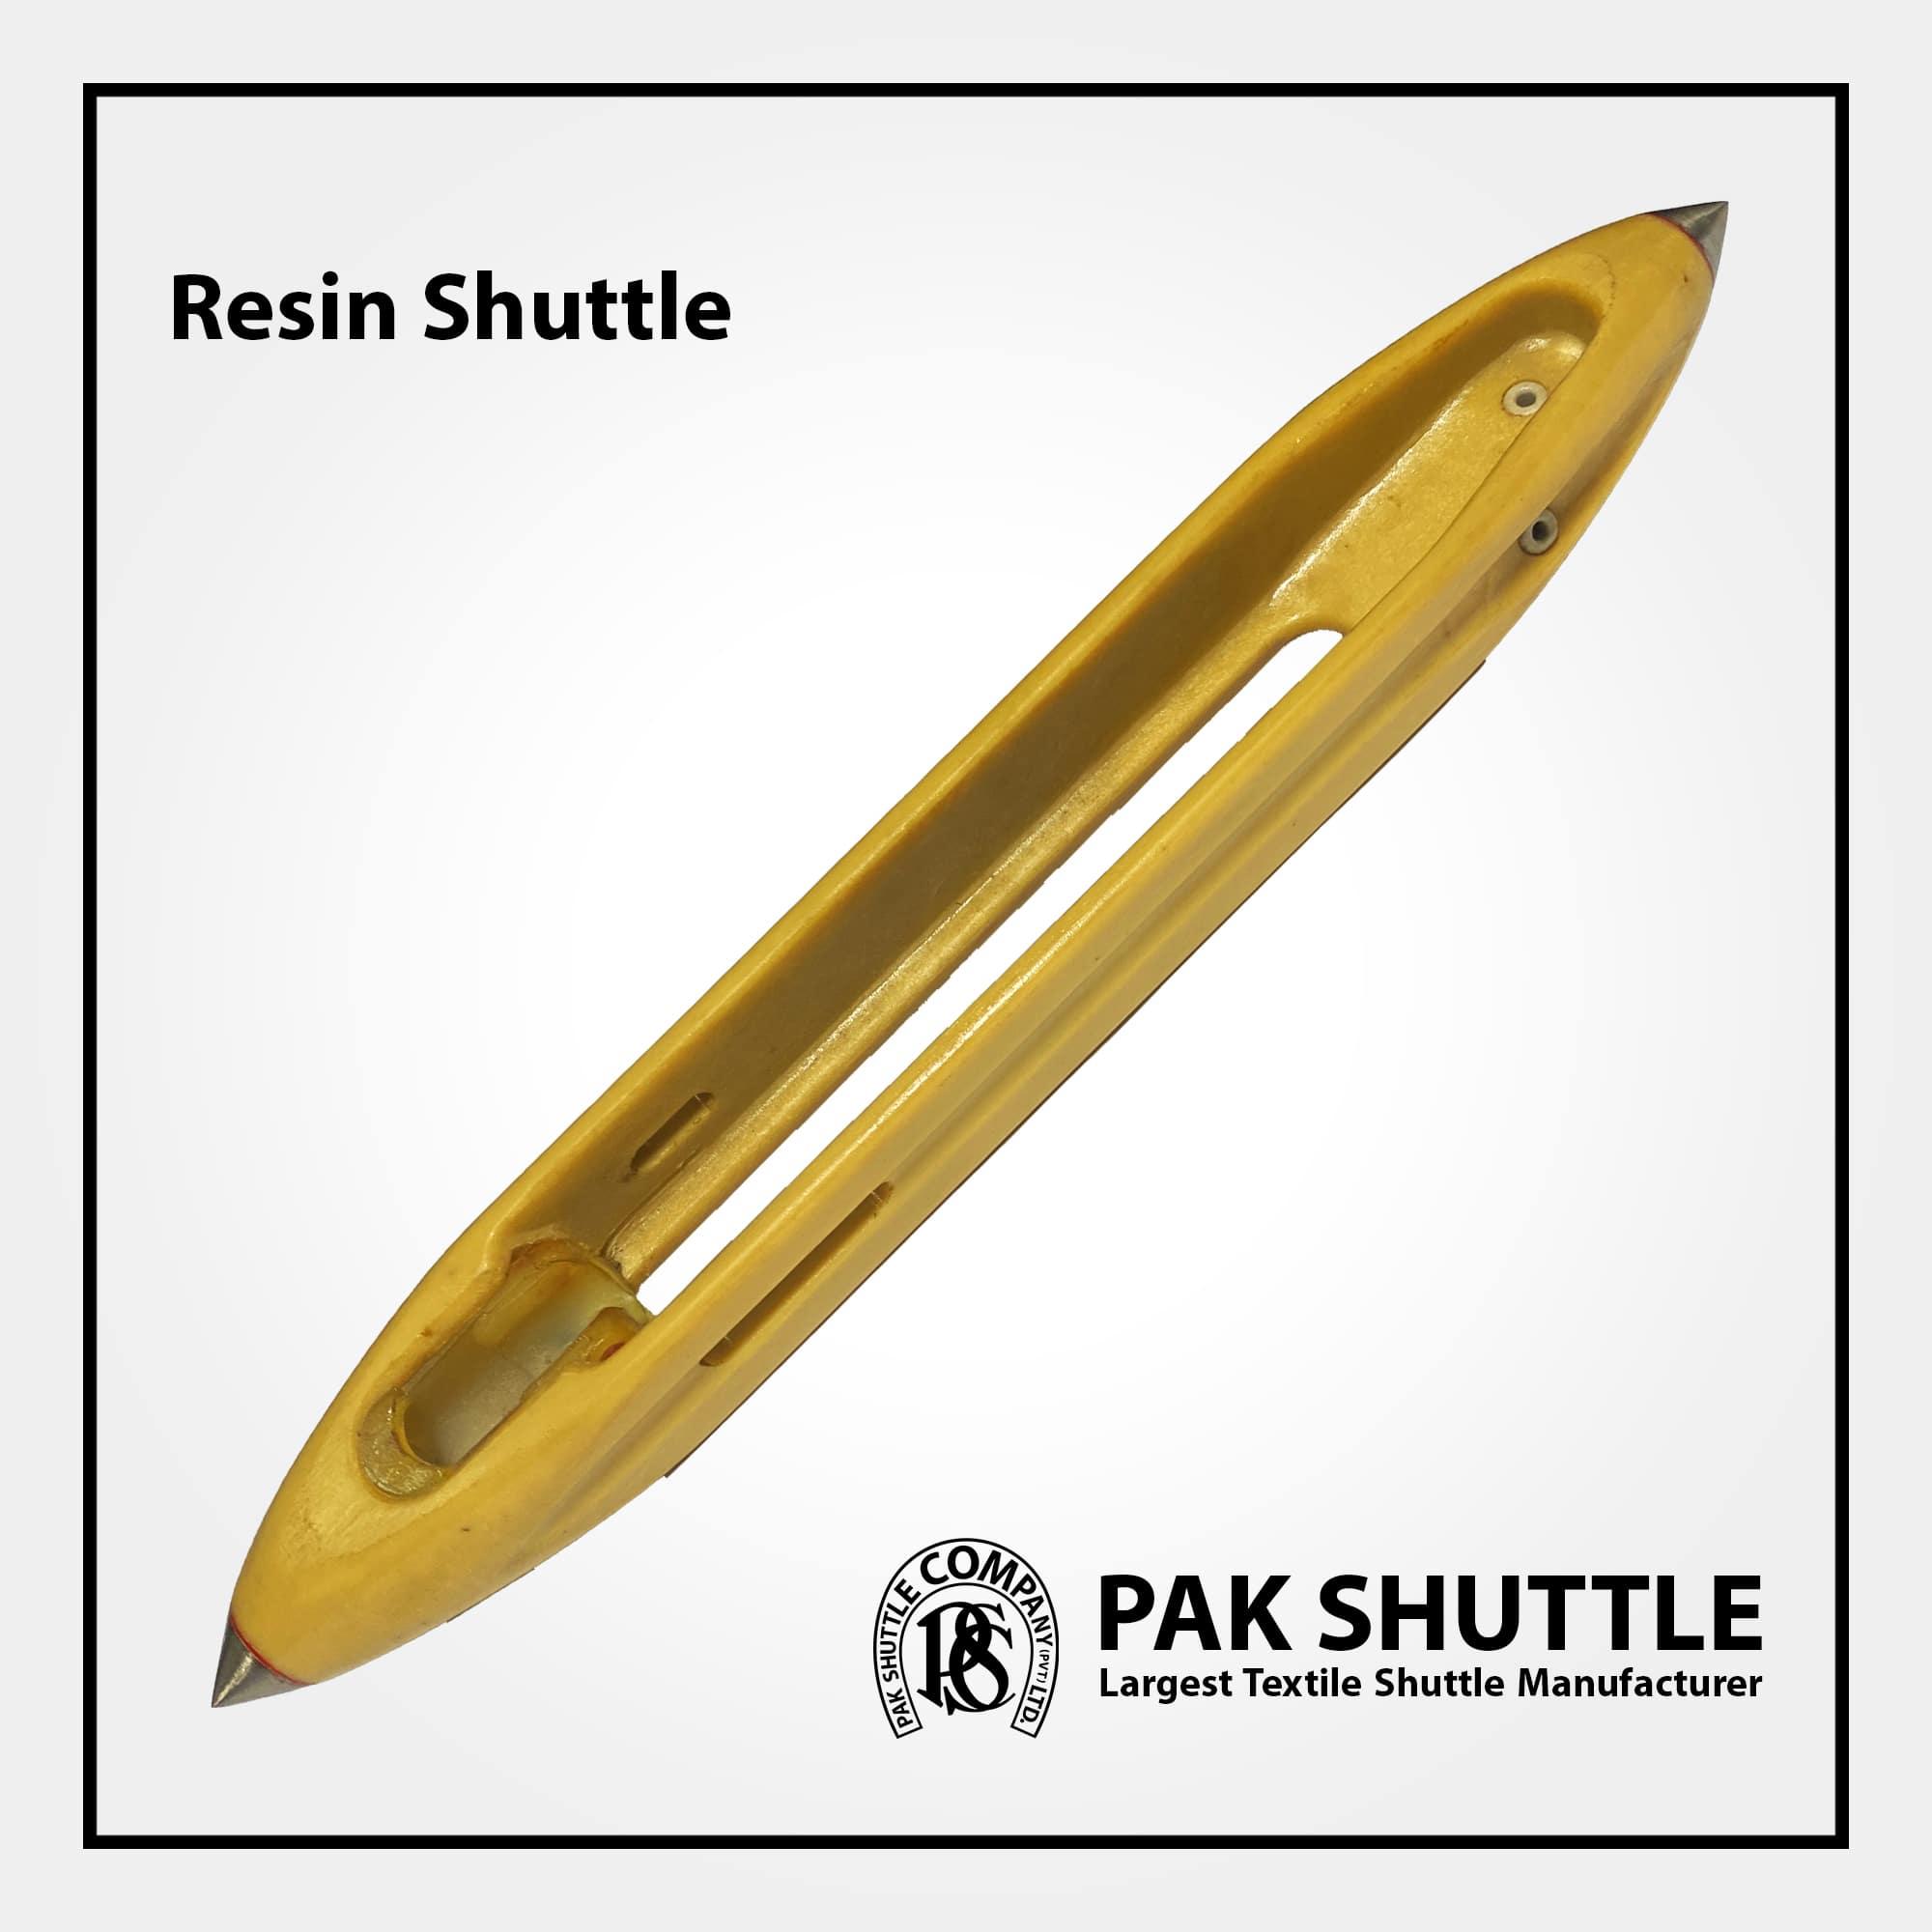 Resin Shuttle by Pak Shuttle Company Pvt Ltd.